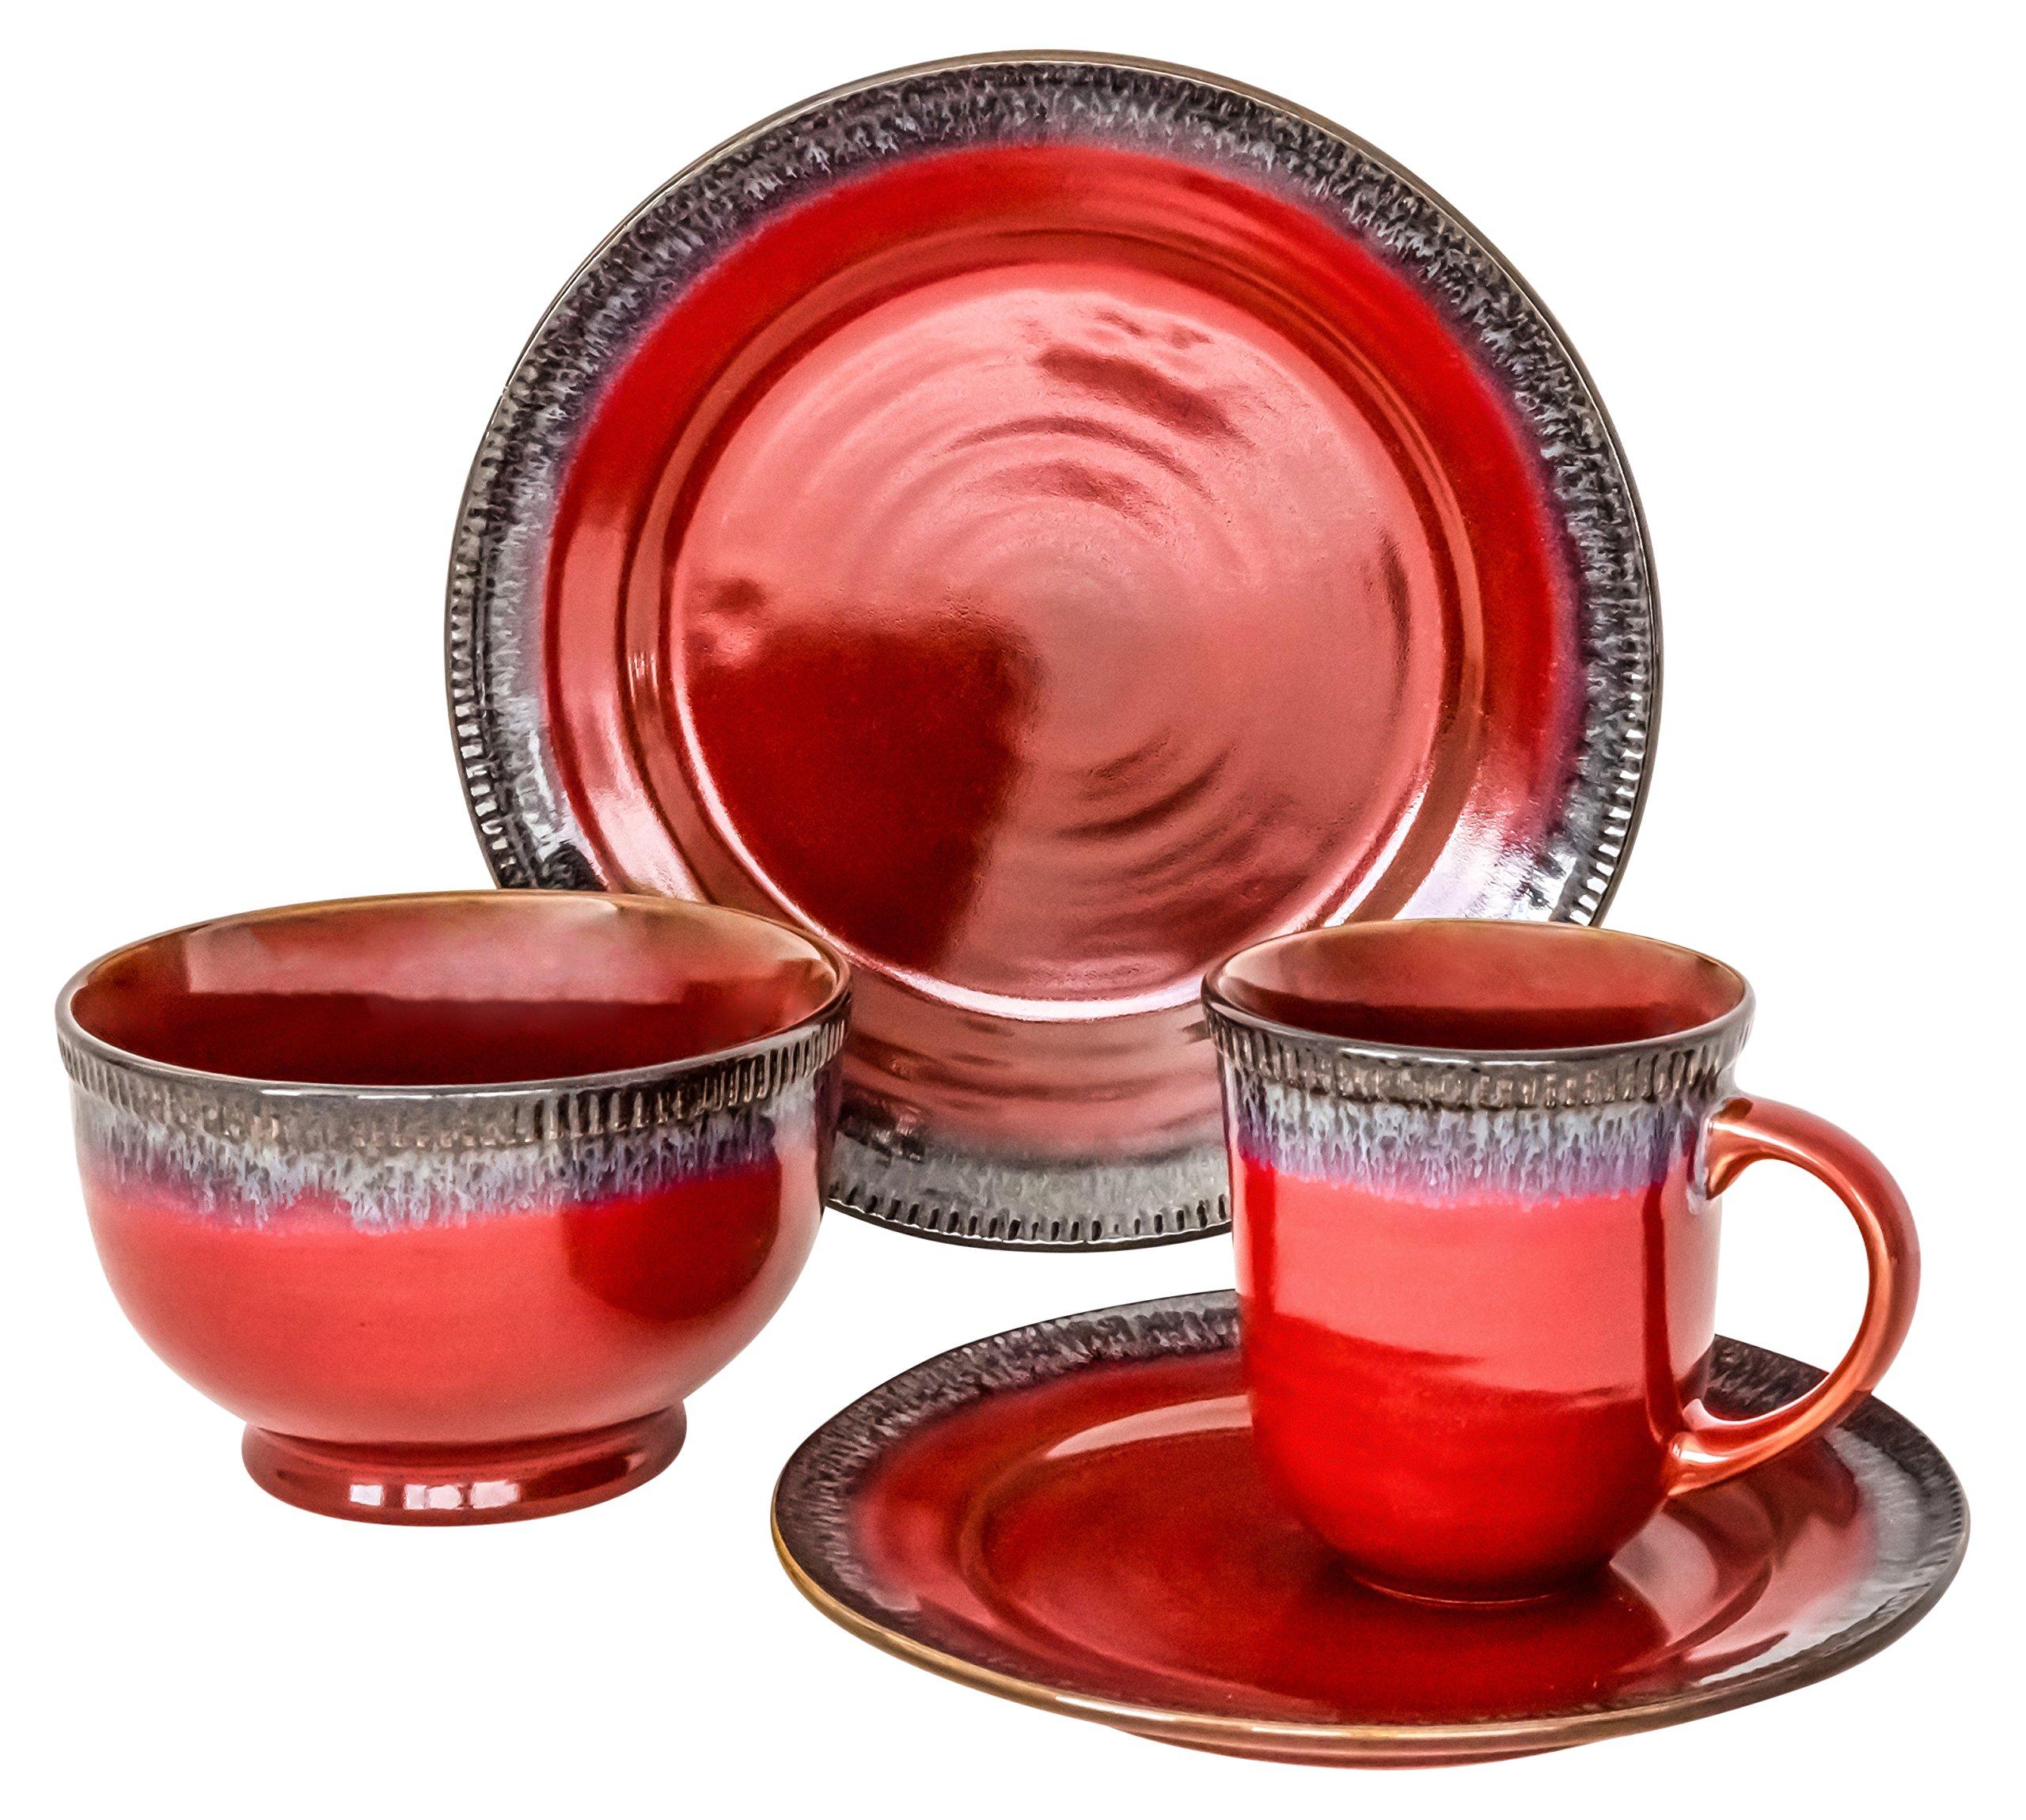 overandback 813056 Cara 16pc Dinnerware Set, Service for 4, Red